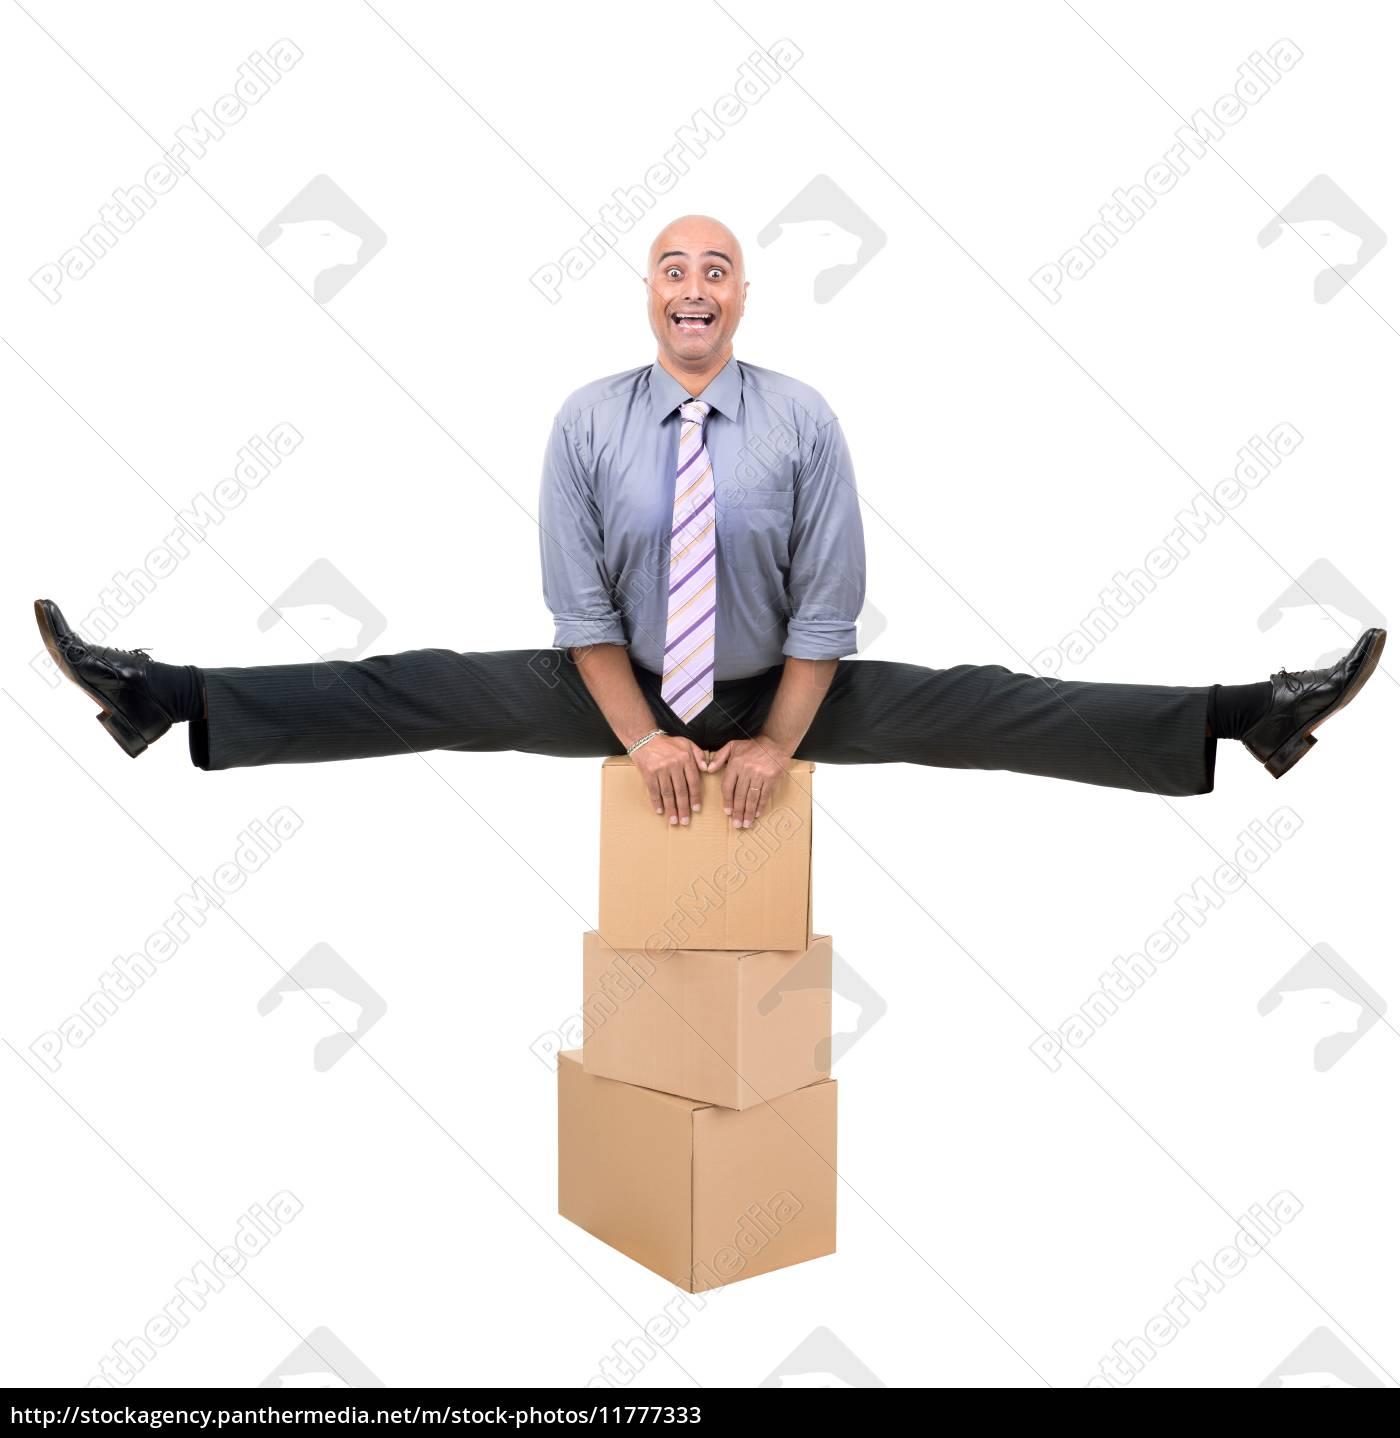 gymnastik - 11777333